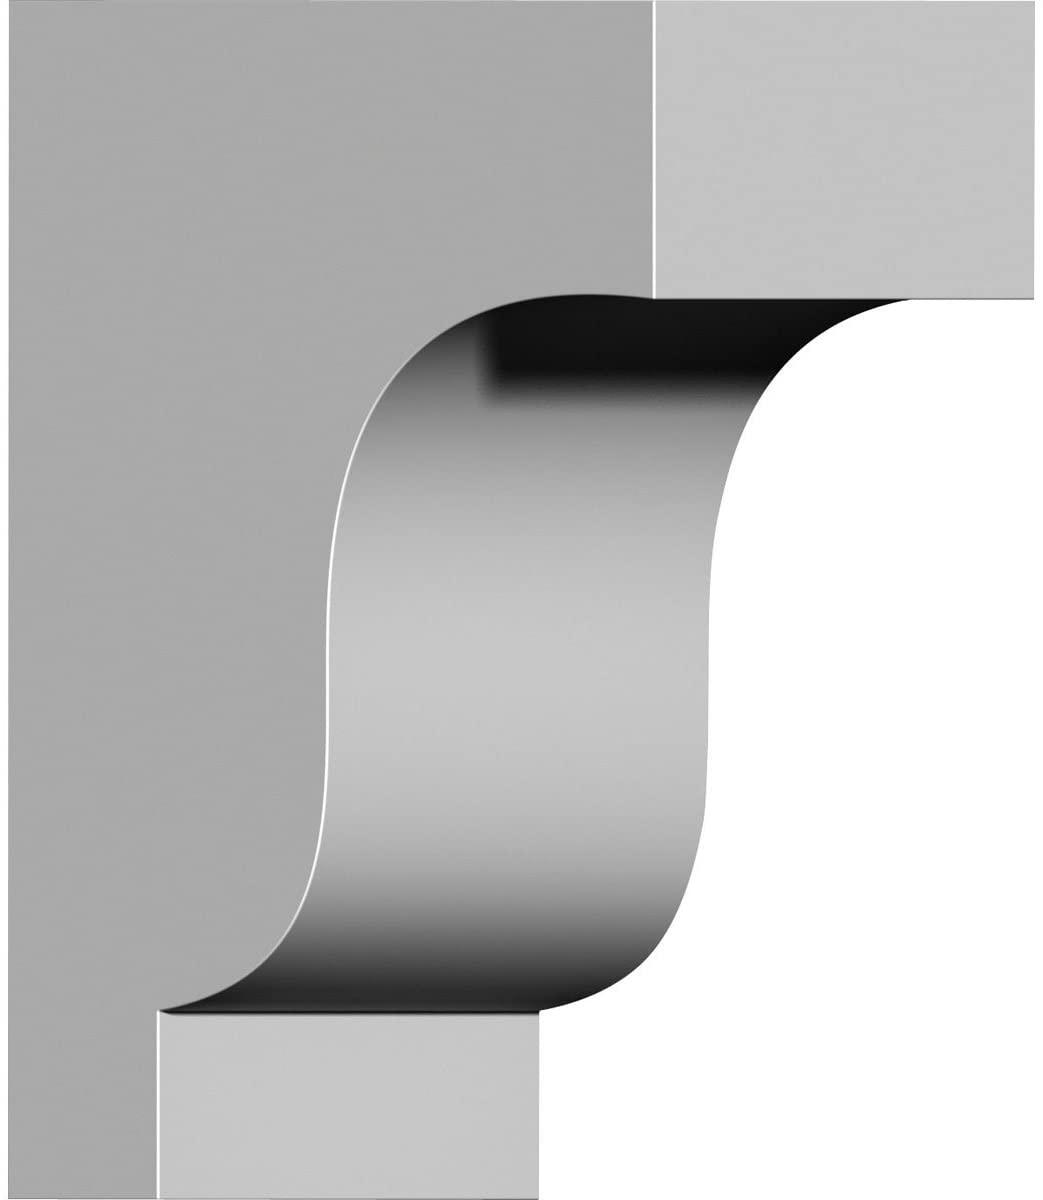 Ekena Millwork COR04X07X10TR-CASE-2 4 1/2 inch W x 7 1/2 inch D x 10 inch H Traditional Corbel (2-Pack),